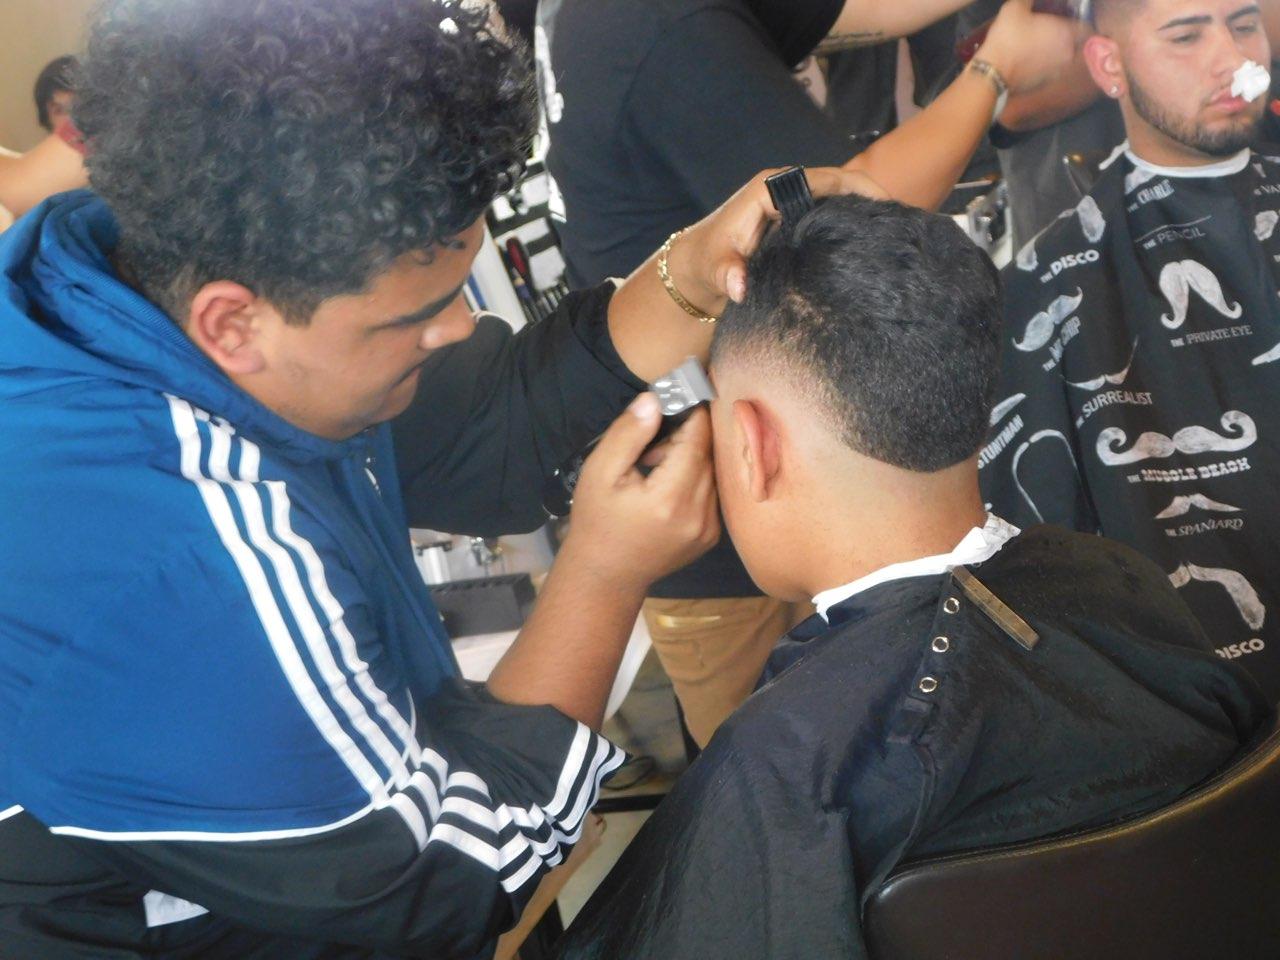 Tapz Cutz Barbershop